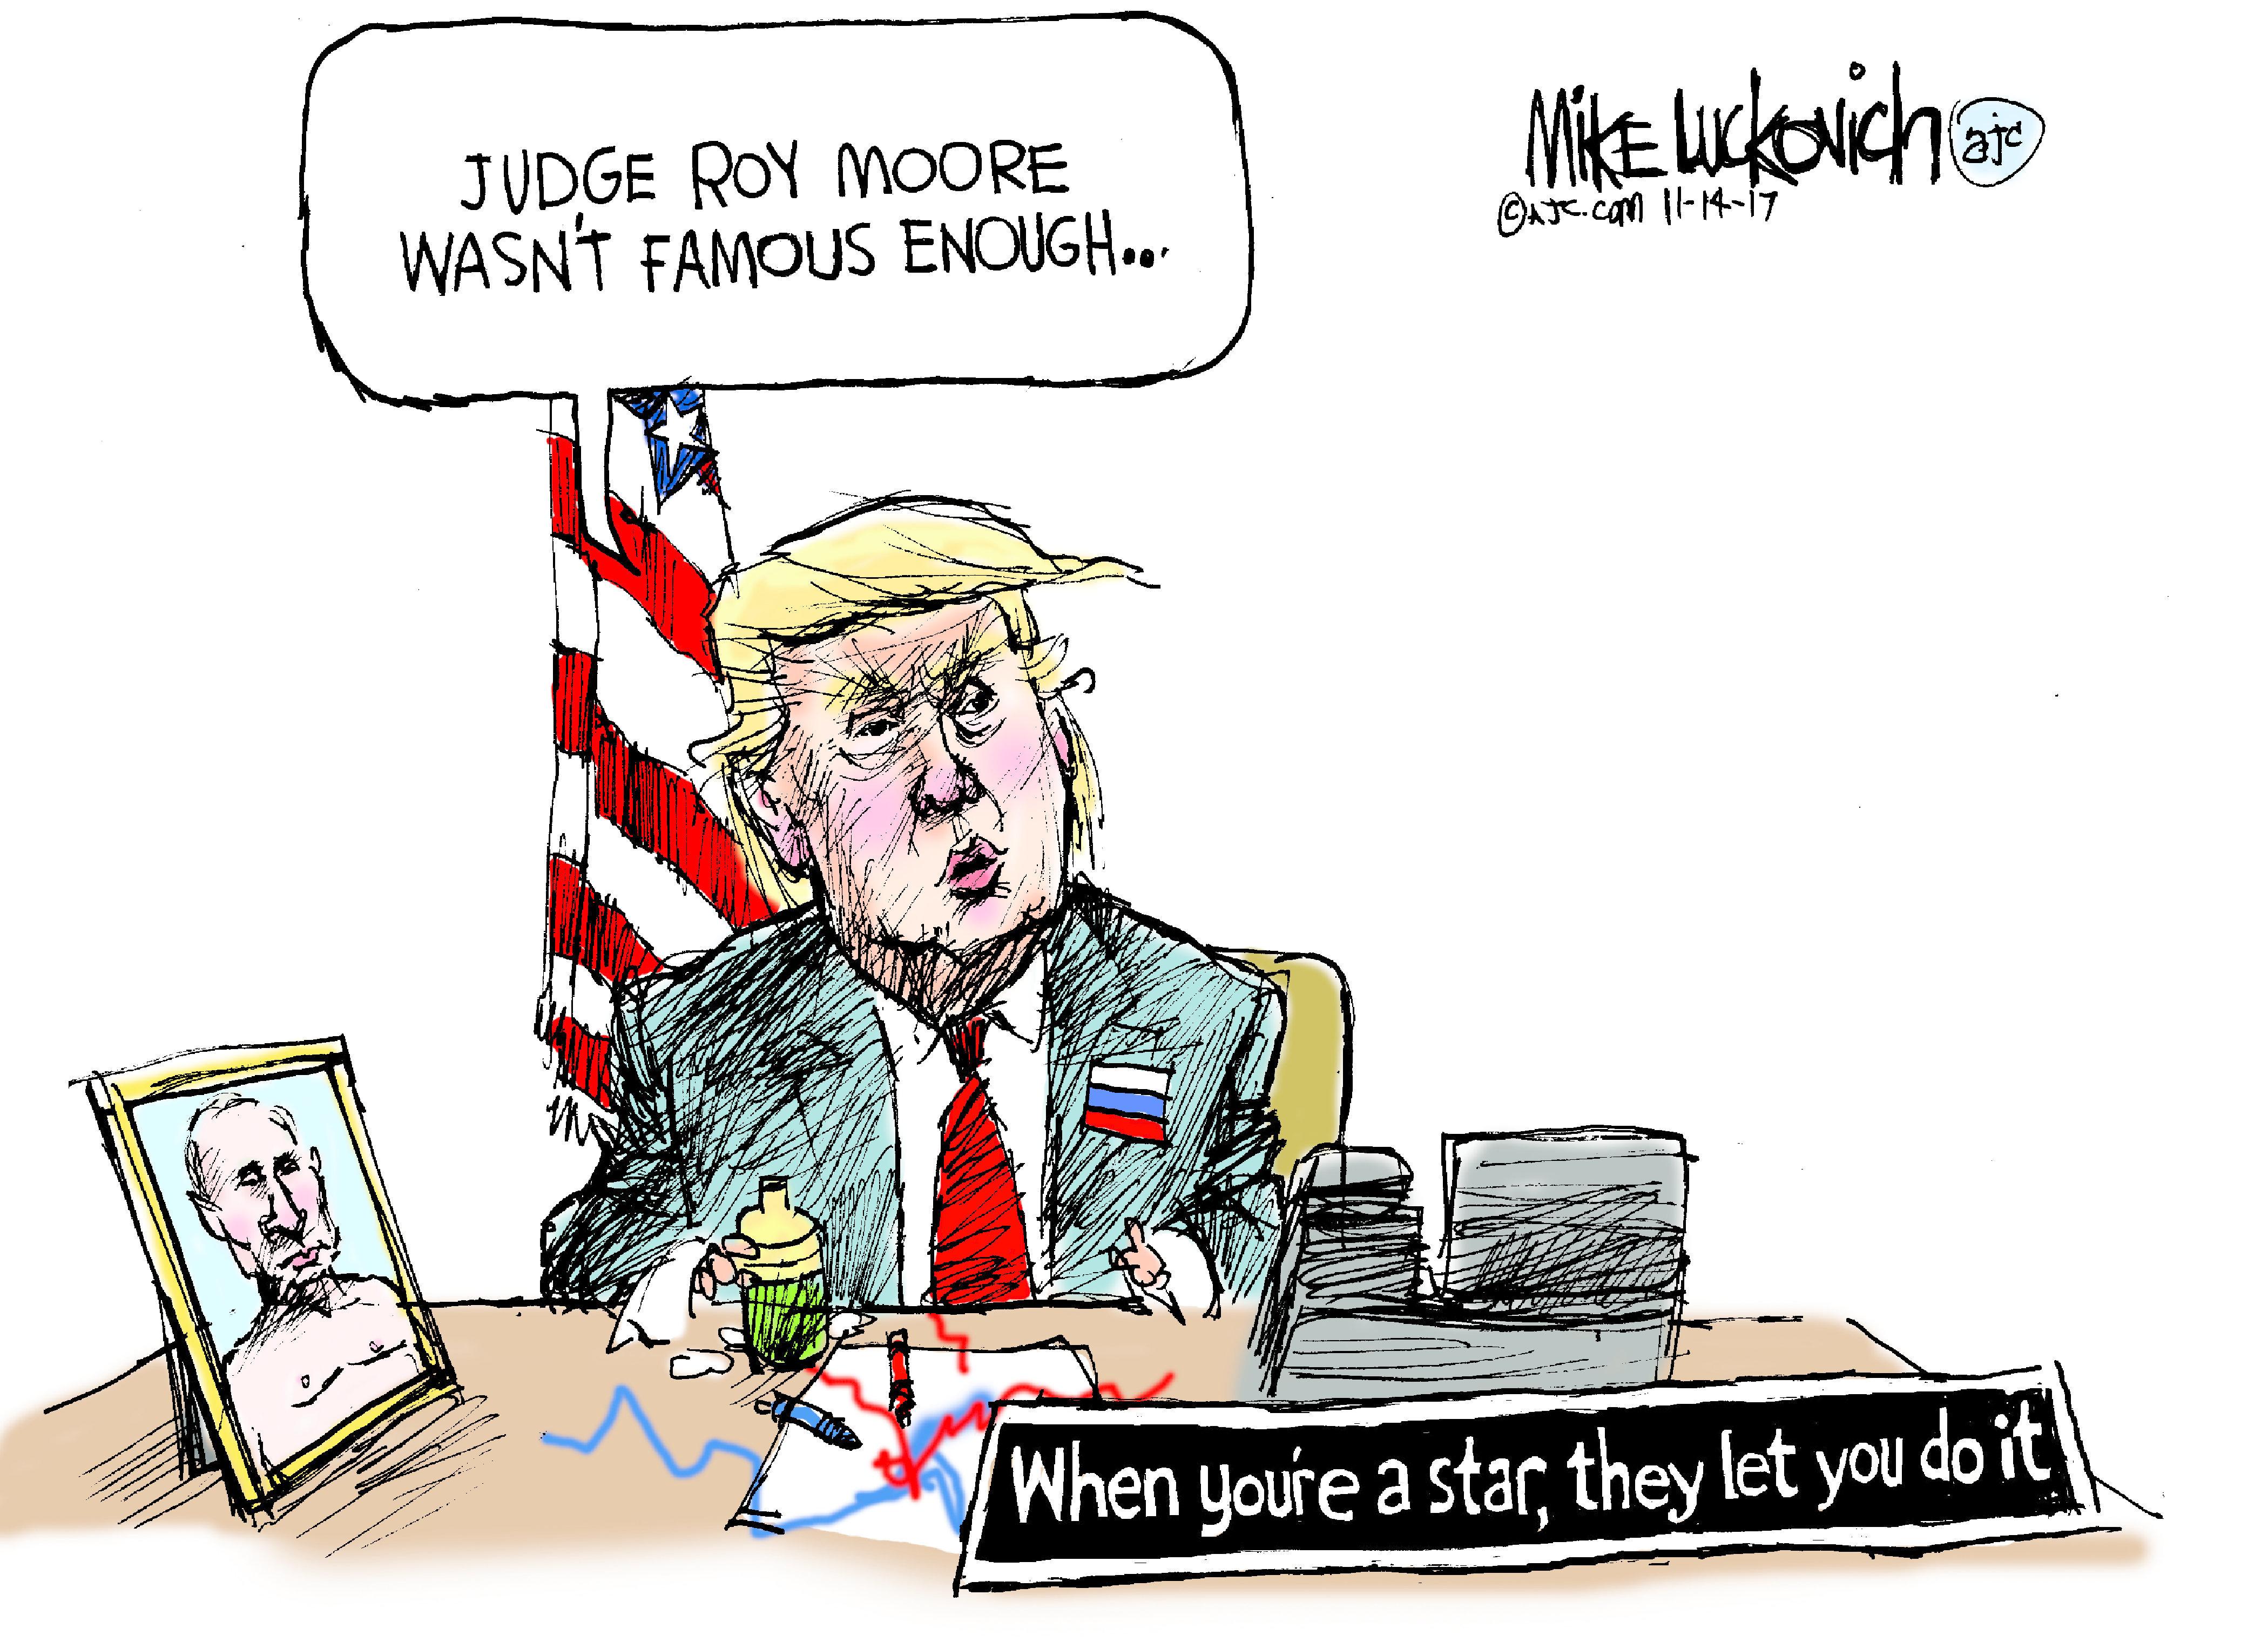 roy-moore-cartoon-luckovich